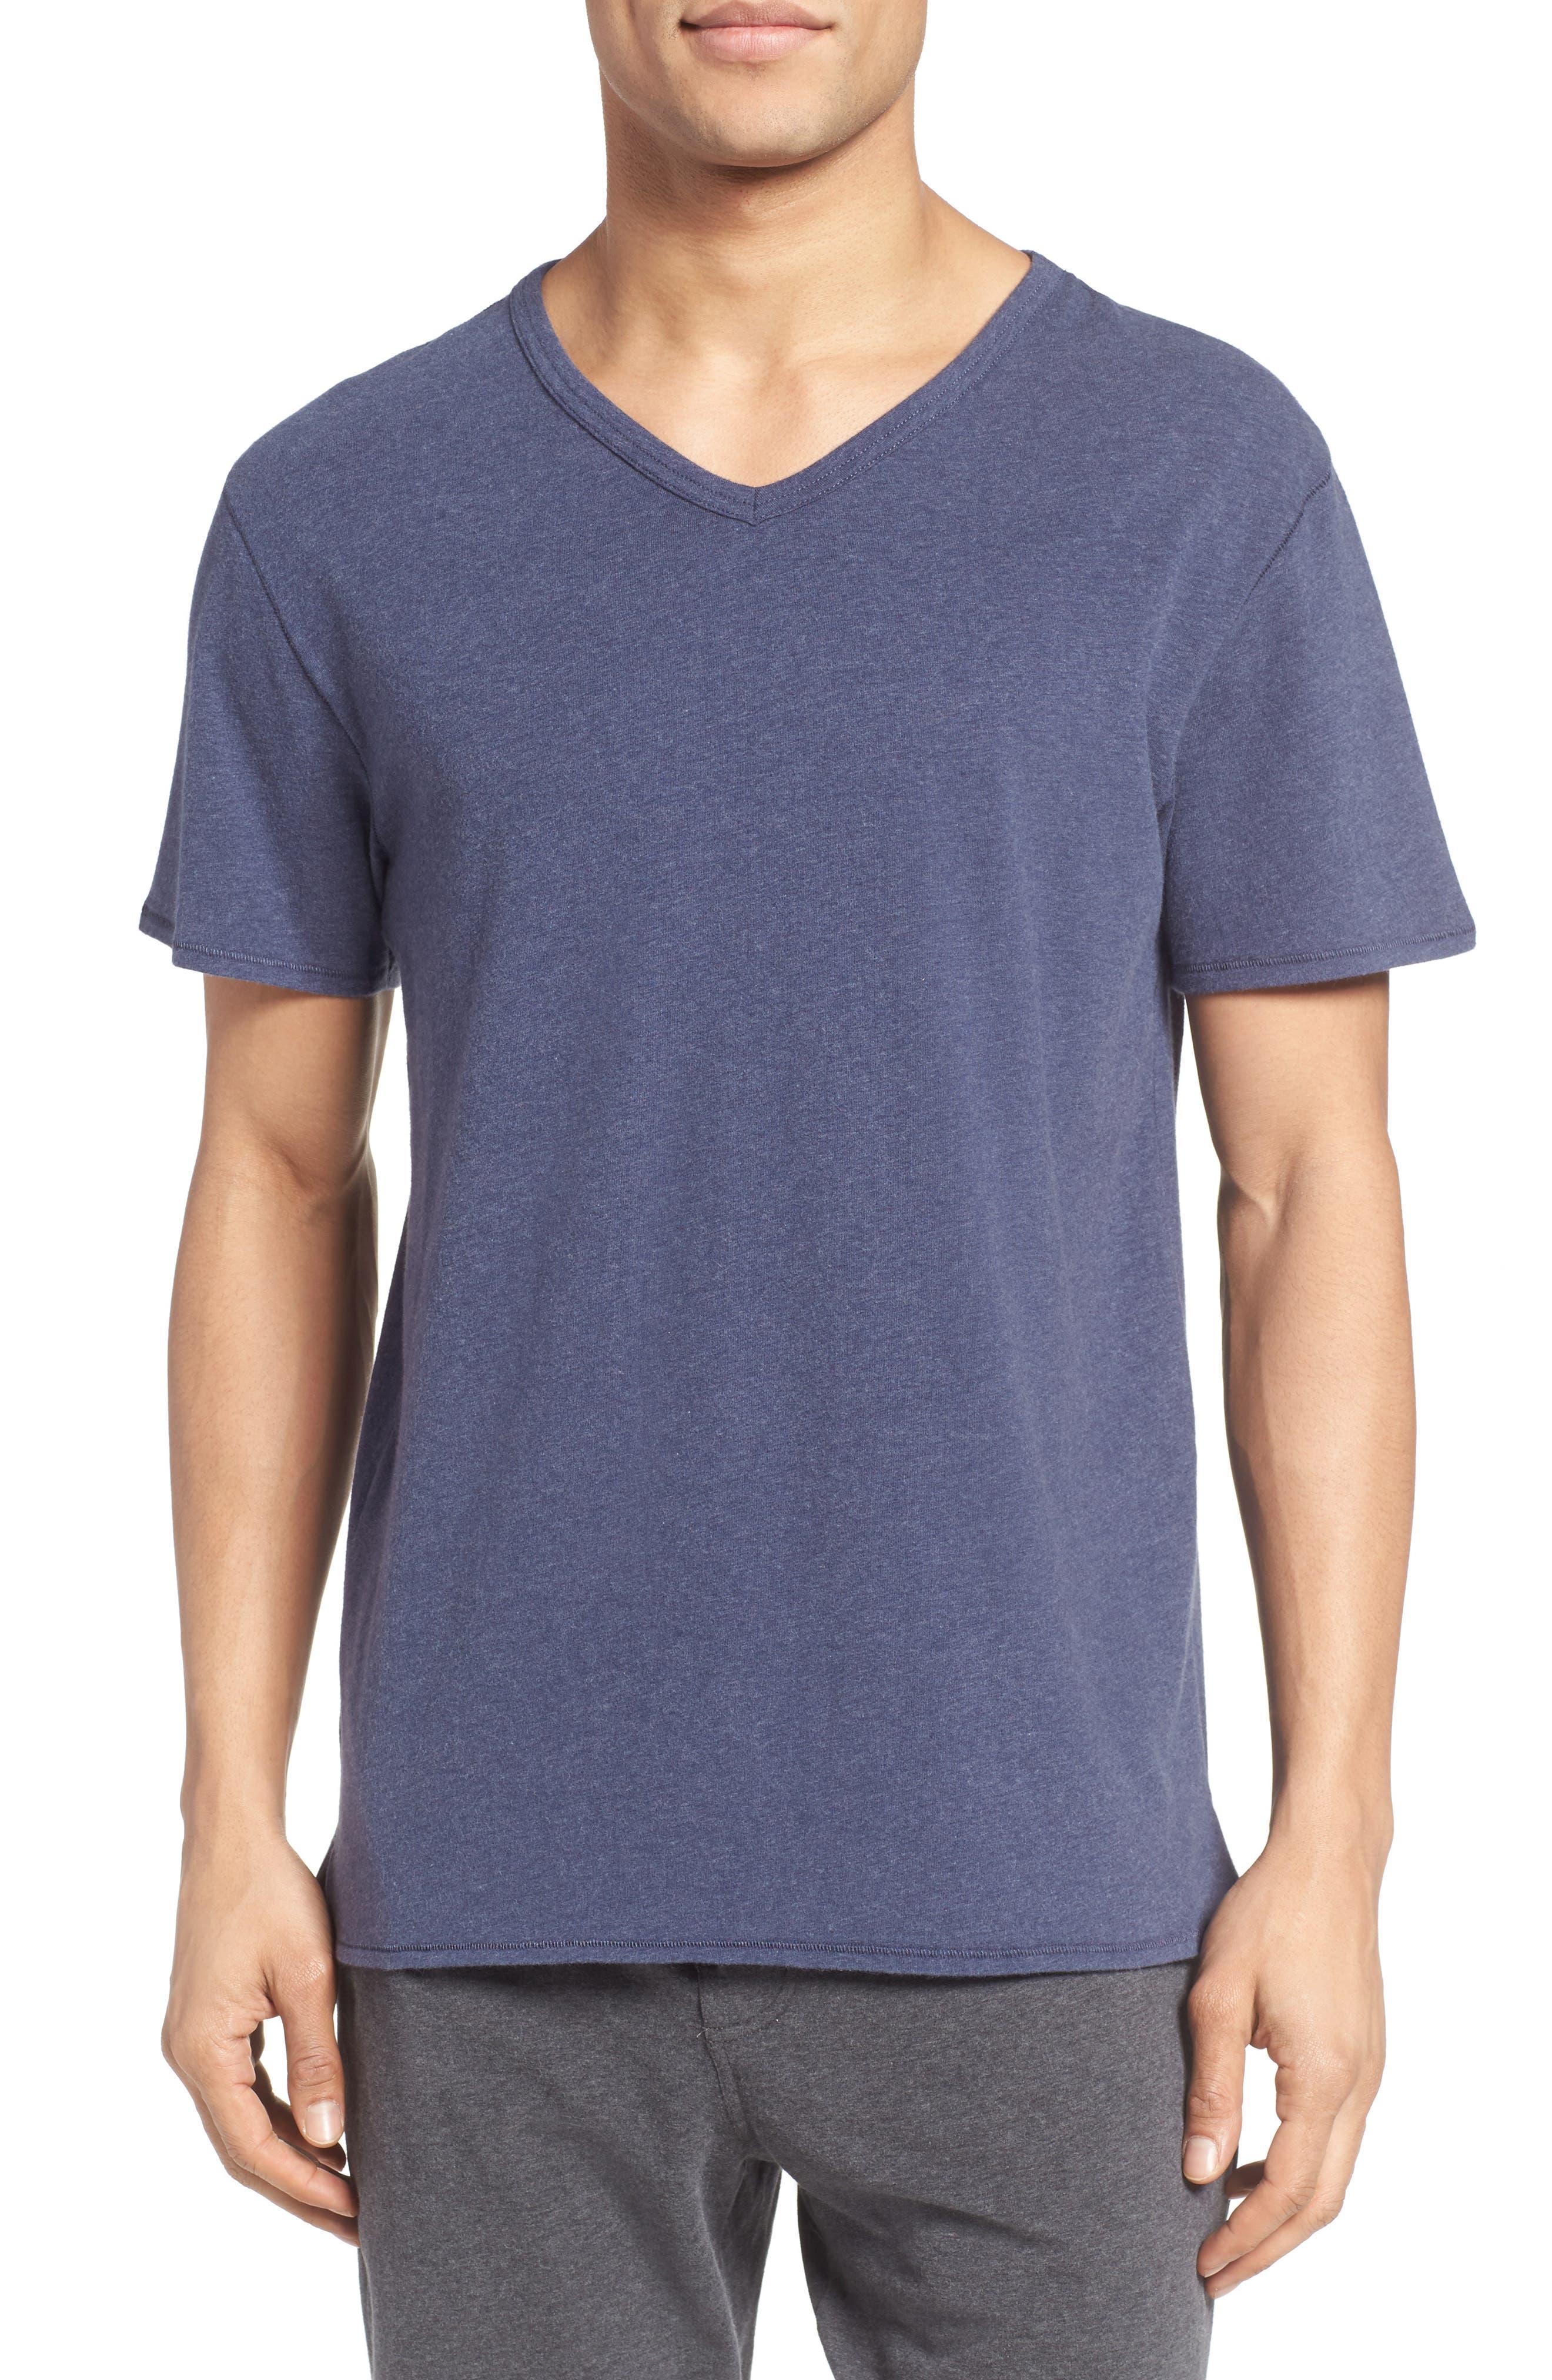 Main Image - Nordstrom Men's Shop Stretch Cotton V-Neck T-Shirt